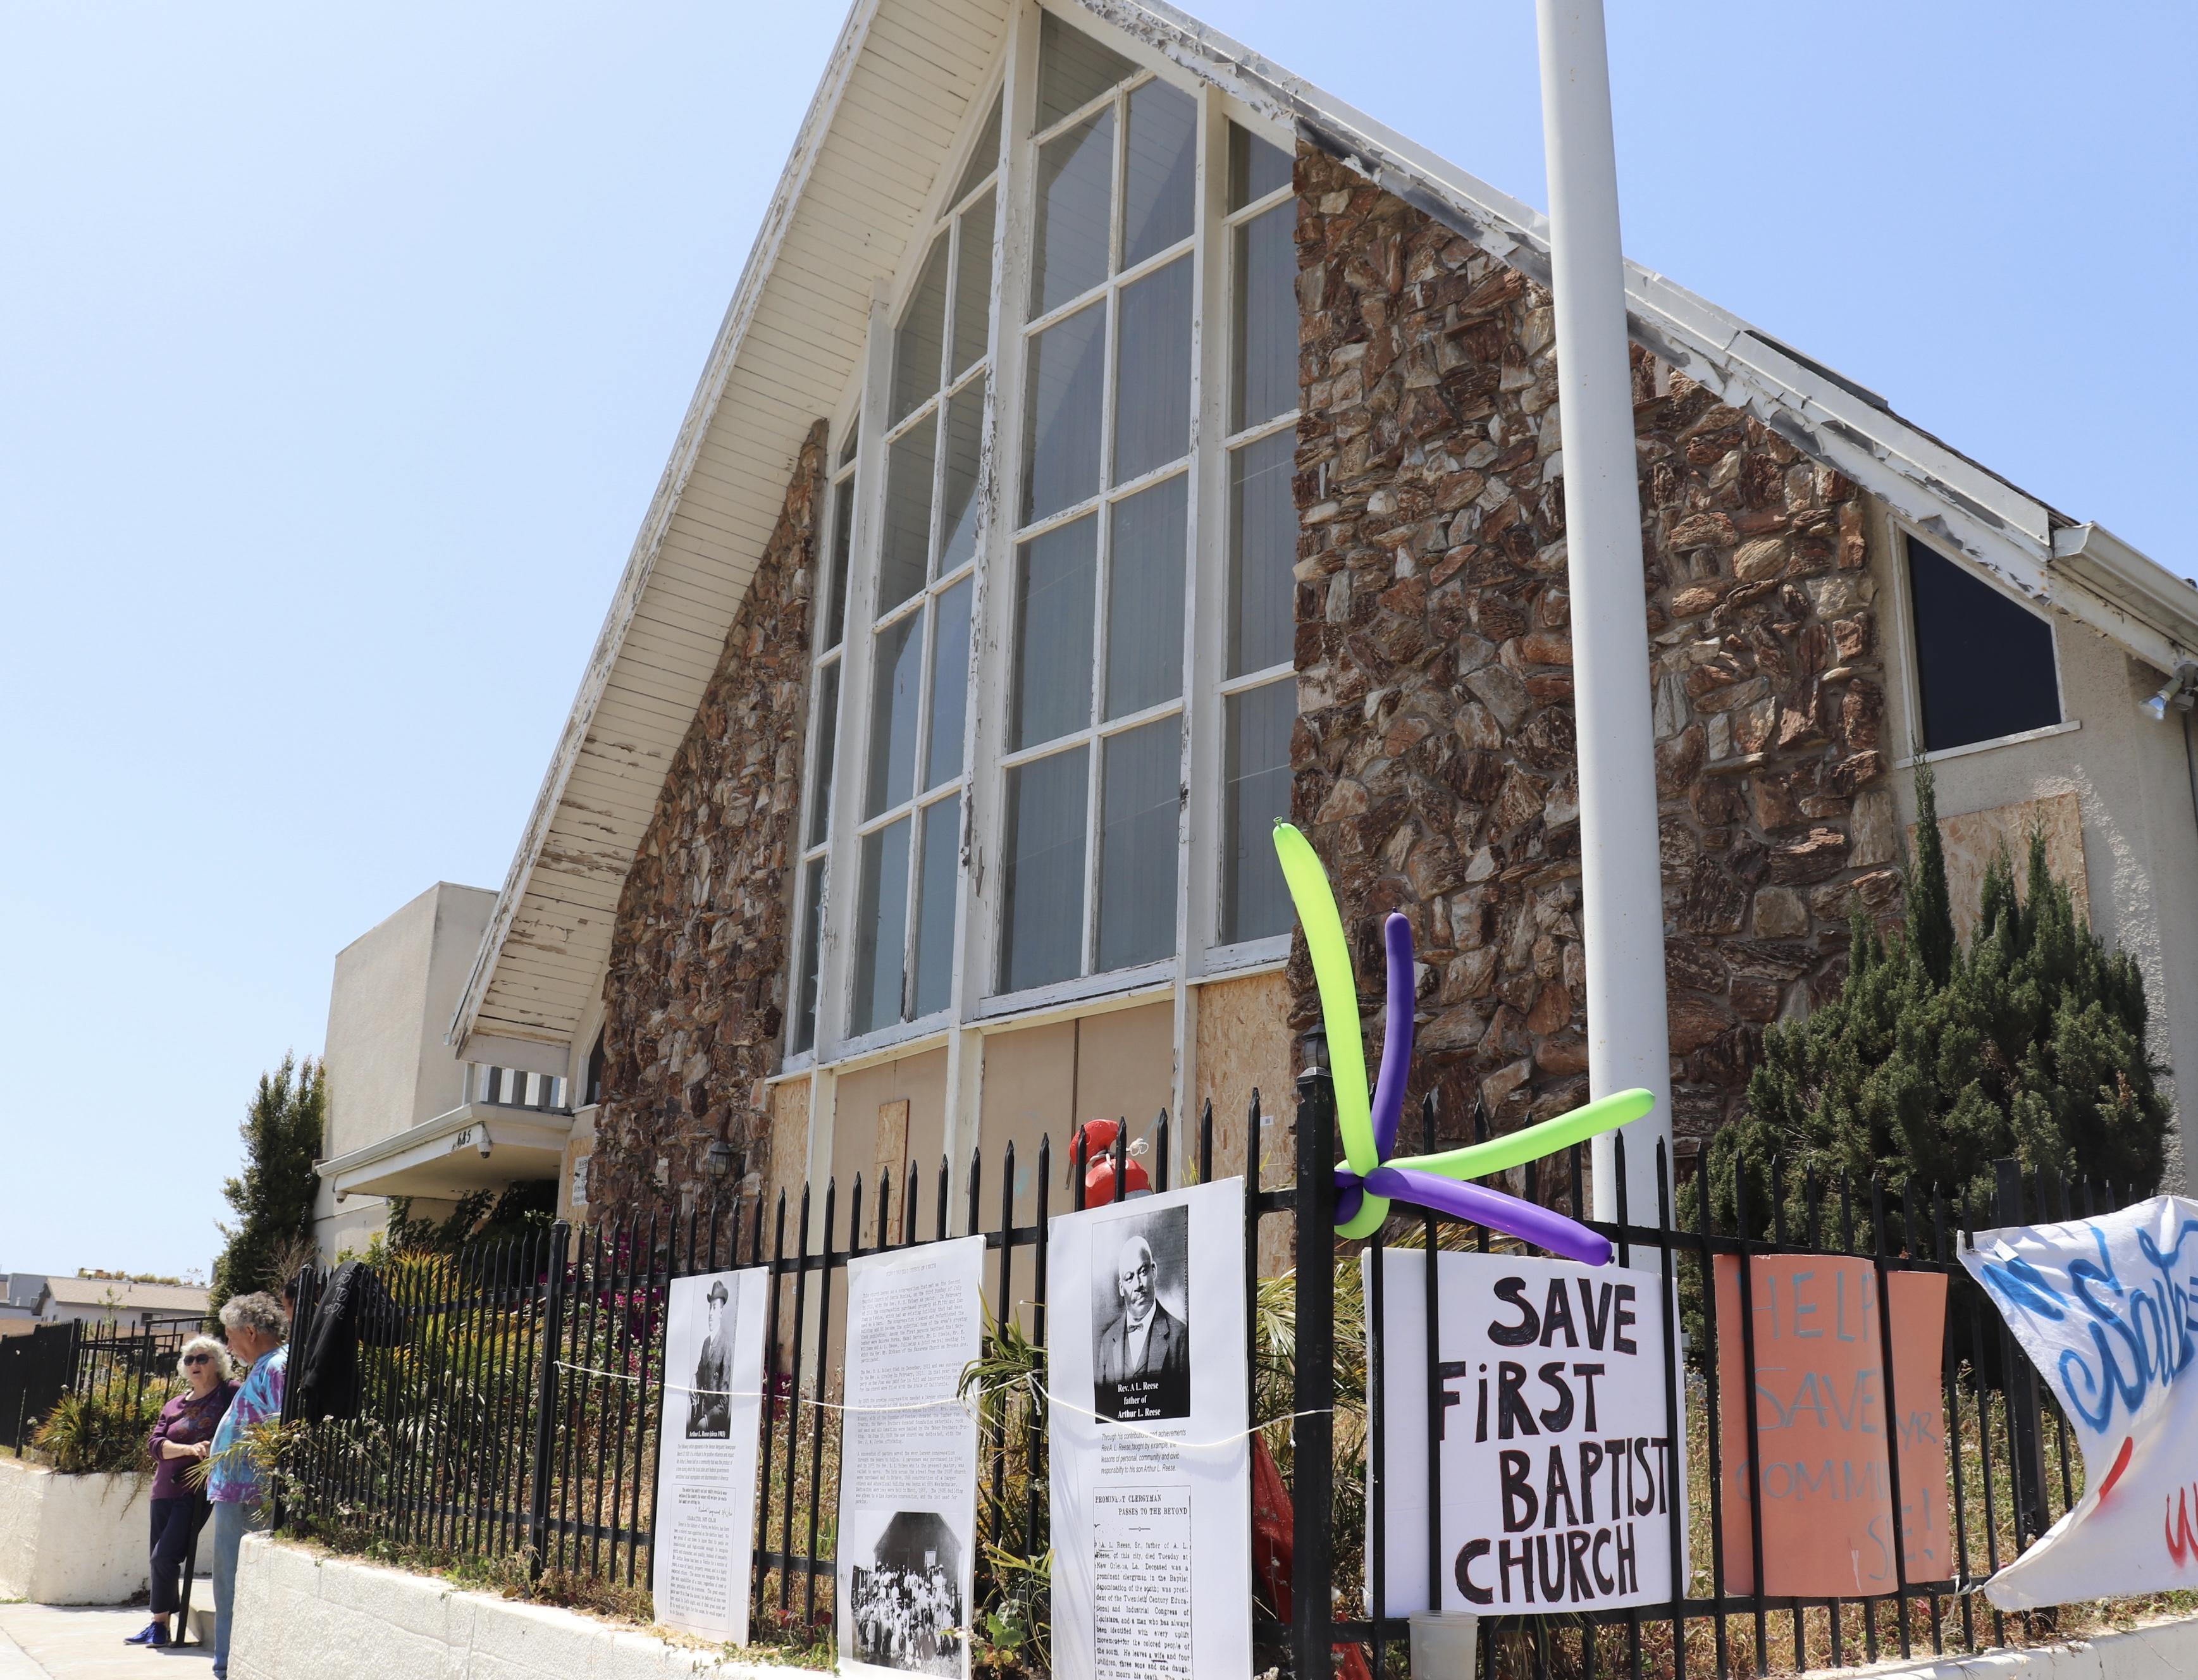 First Baptist Church in Venice